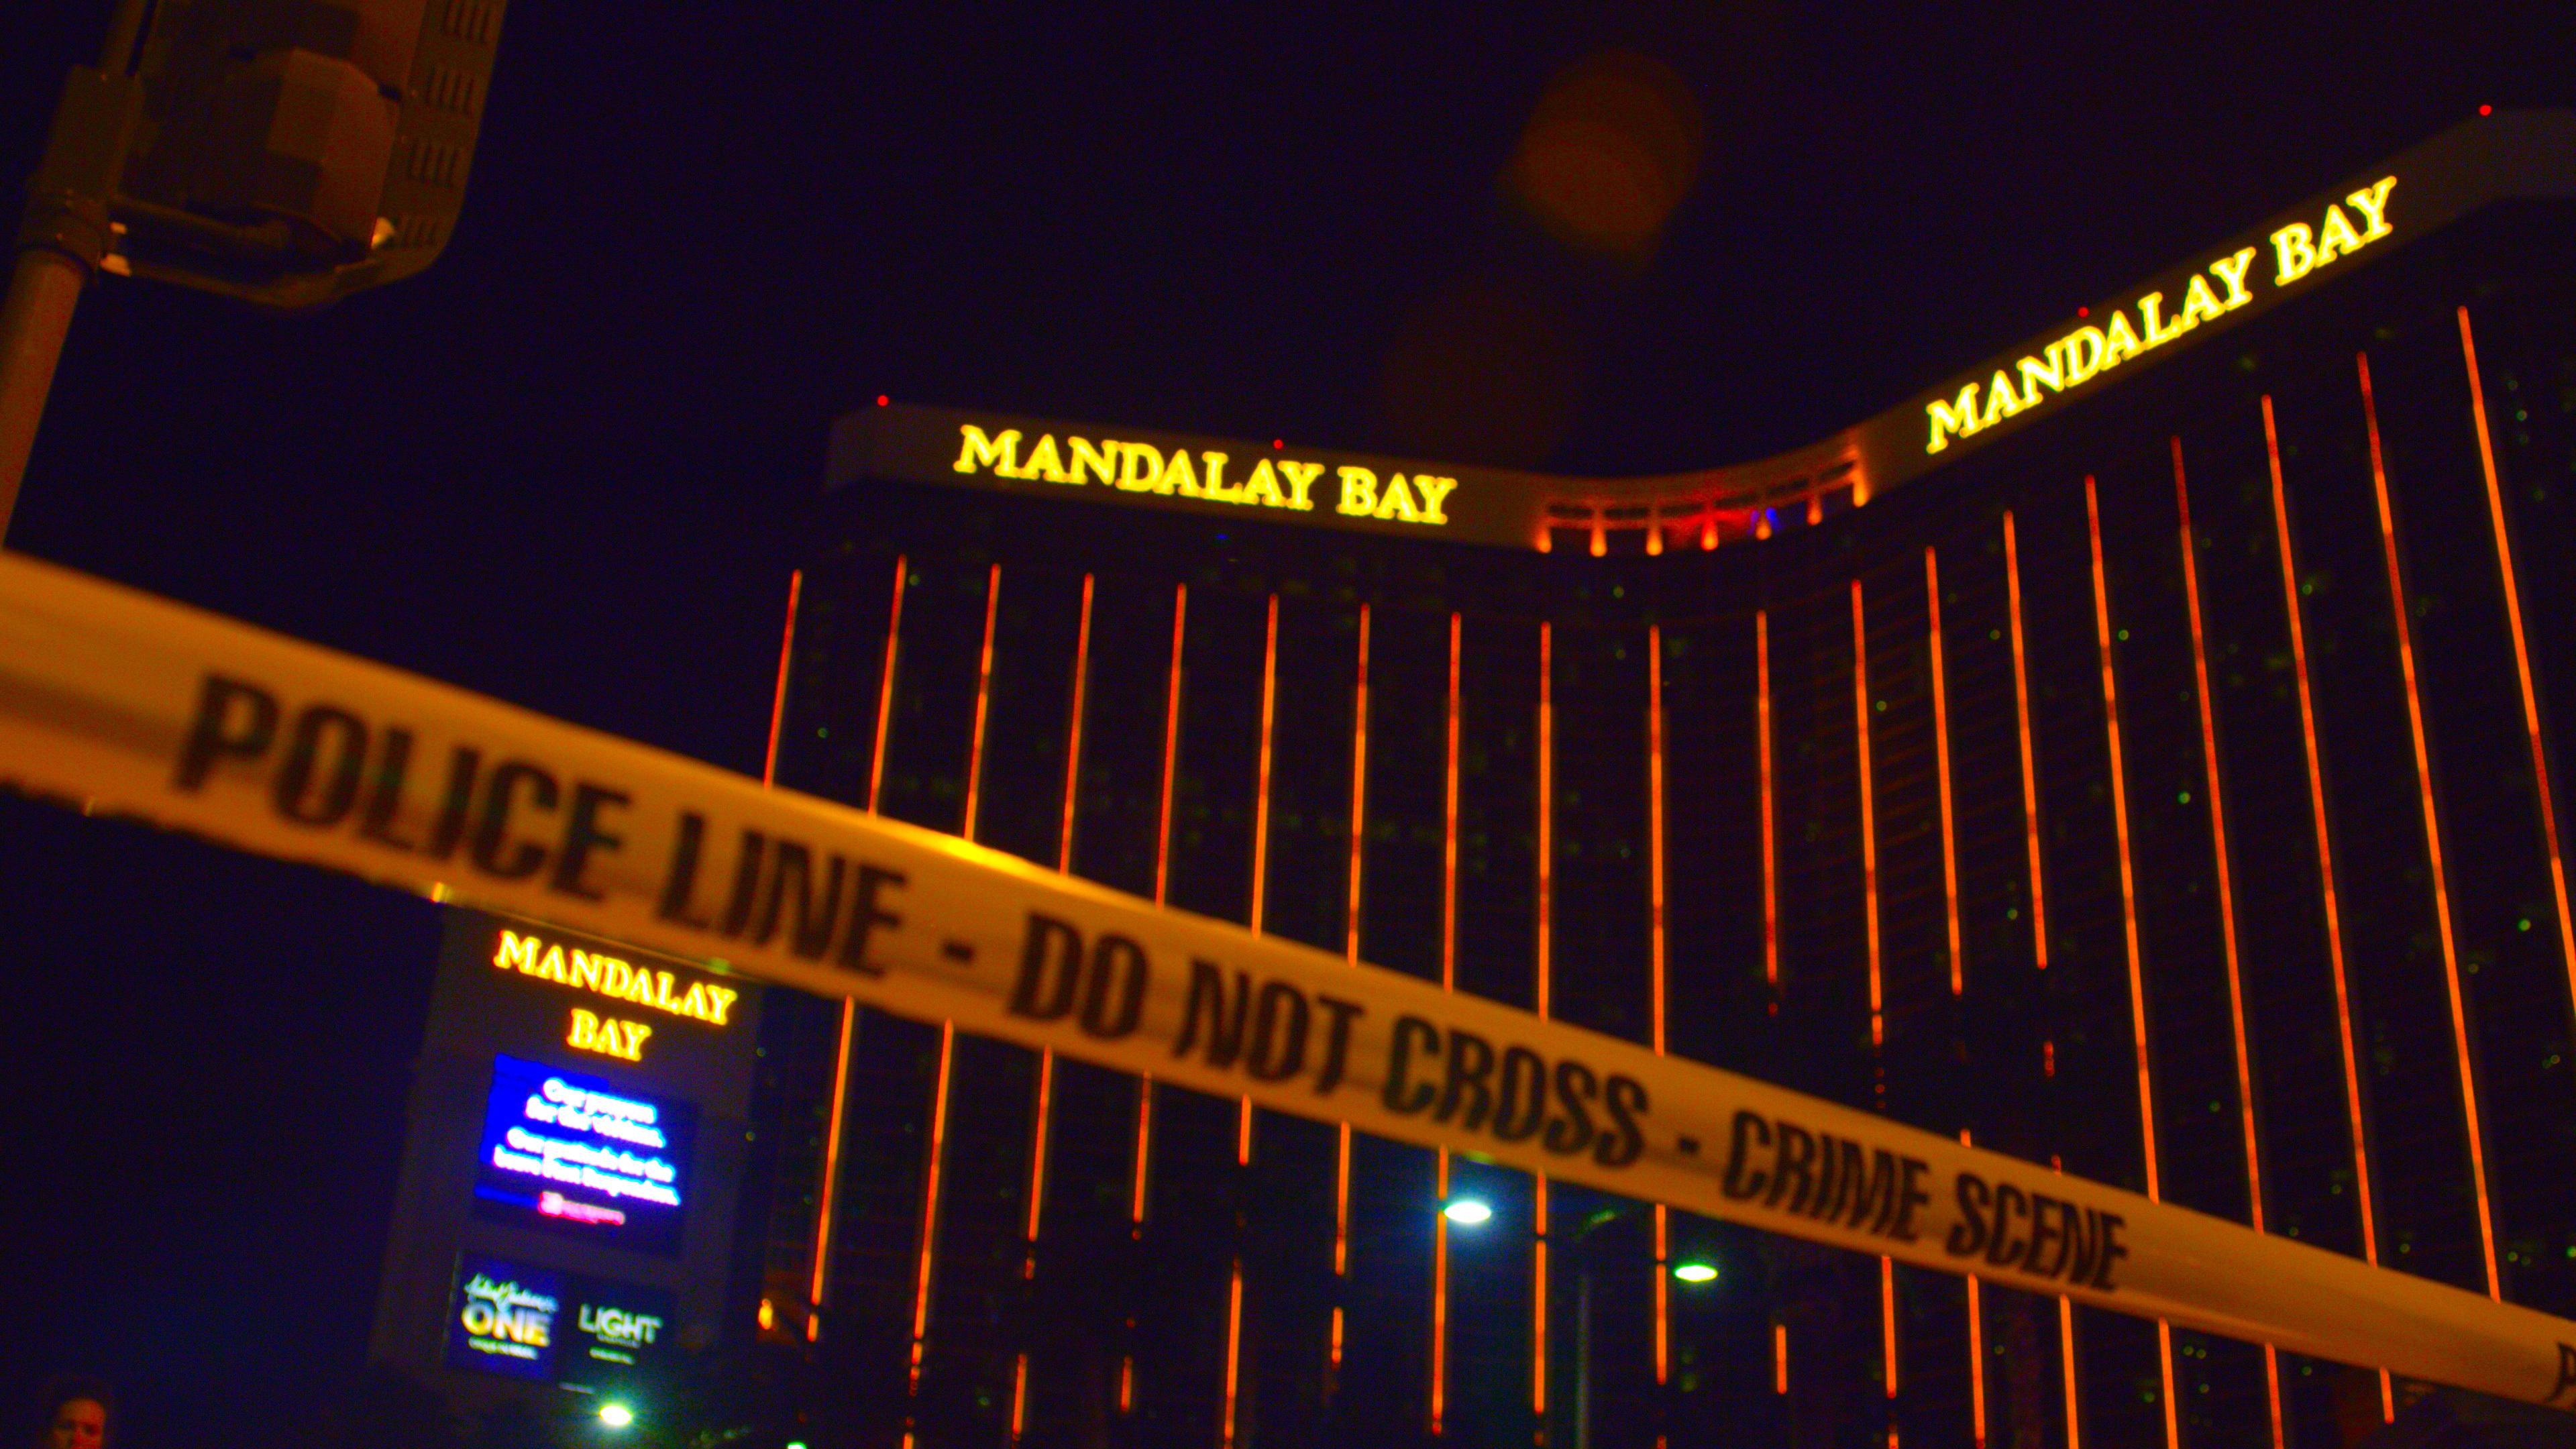 'More than one villain': Las Vegas mass shooting explored